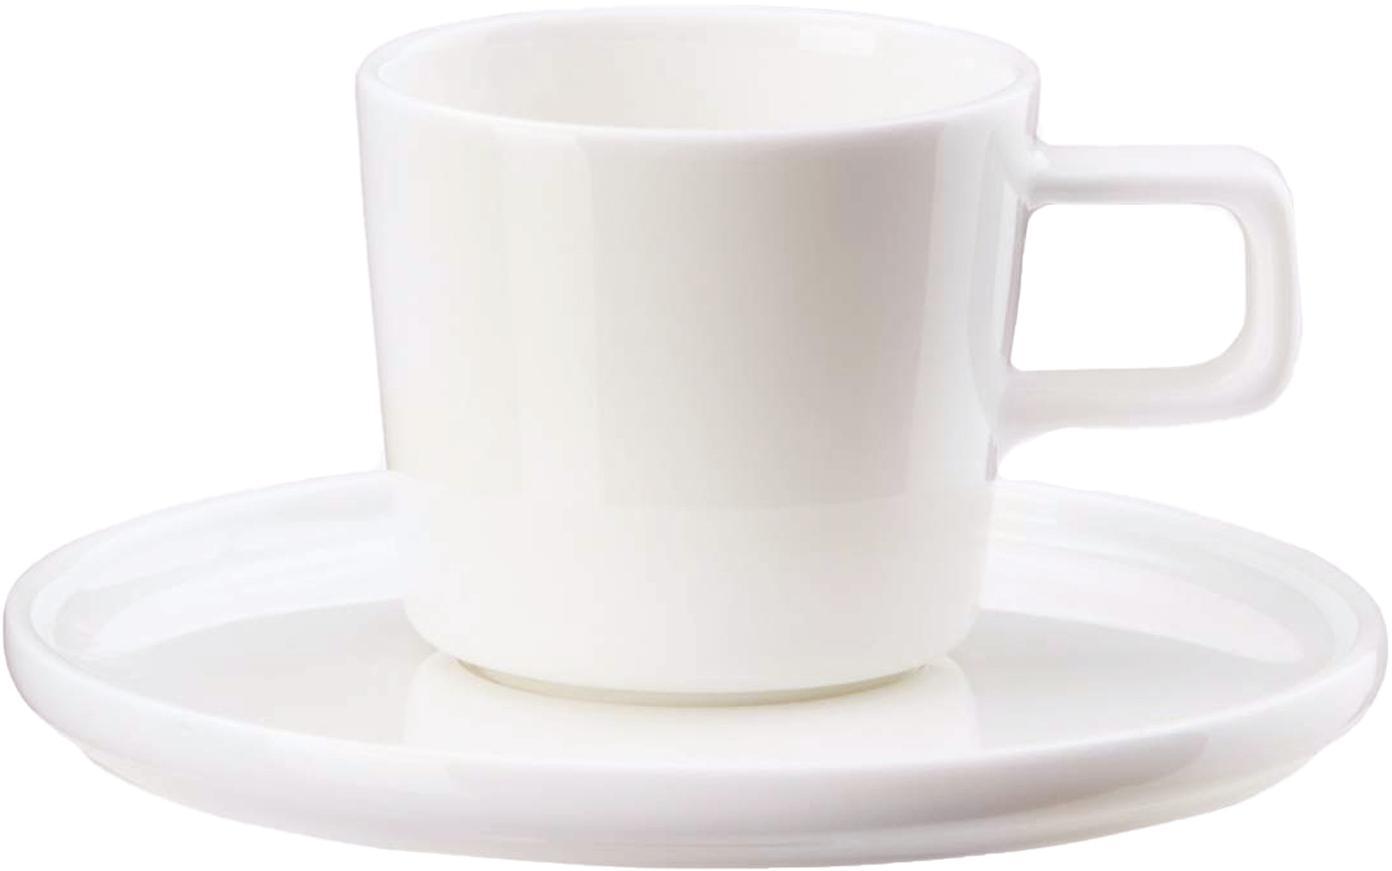 Tazas con platitos Oco, 6uds., Porcelana fina, Marfil, Ø 6 x Al 7 cm